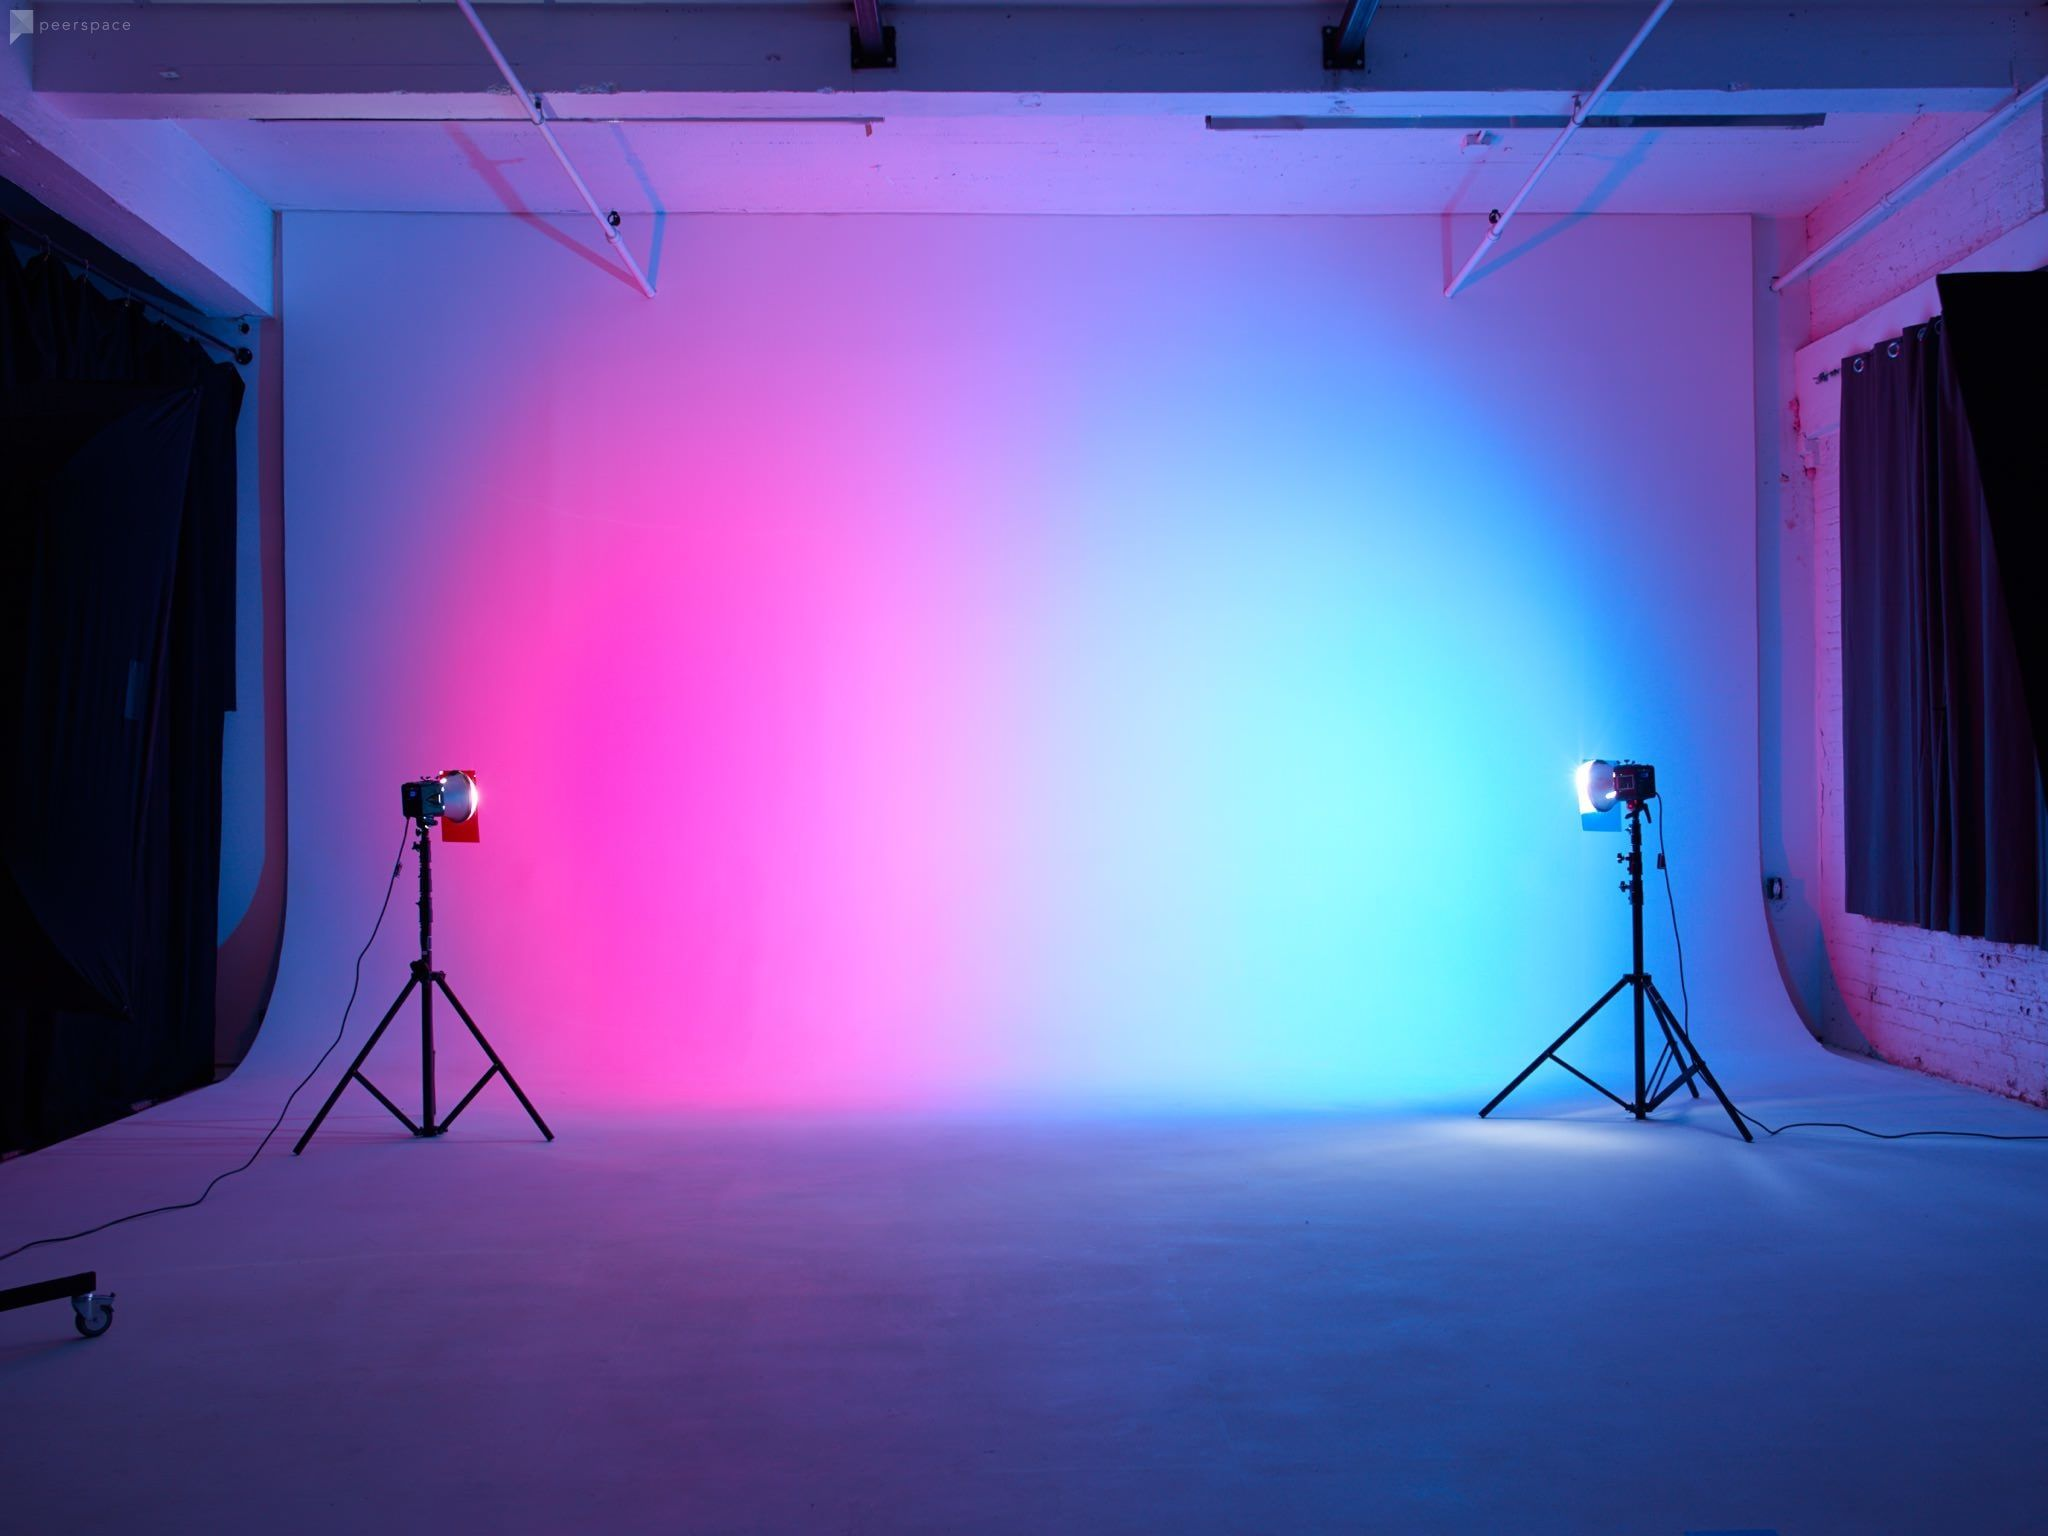 Spacious Photo Video Cyc Studio In Ridgewood Photo Studio Design Photoshoot Backdrops Studio Lighting Setups